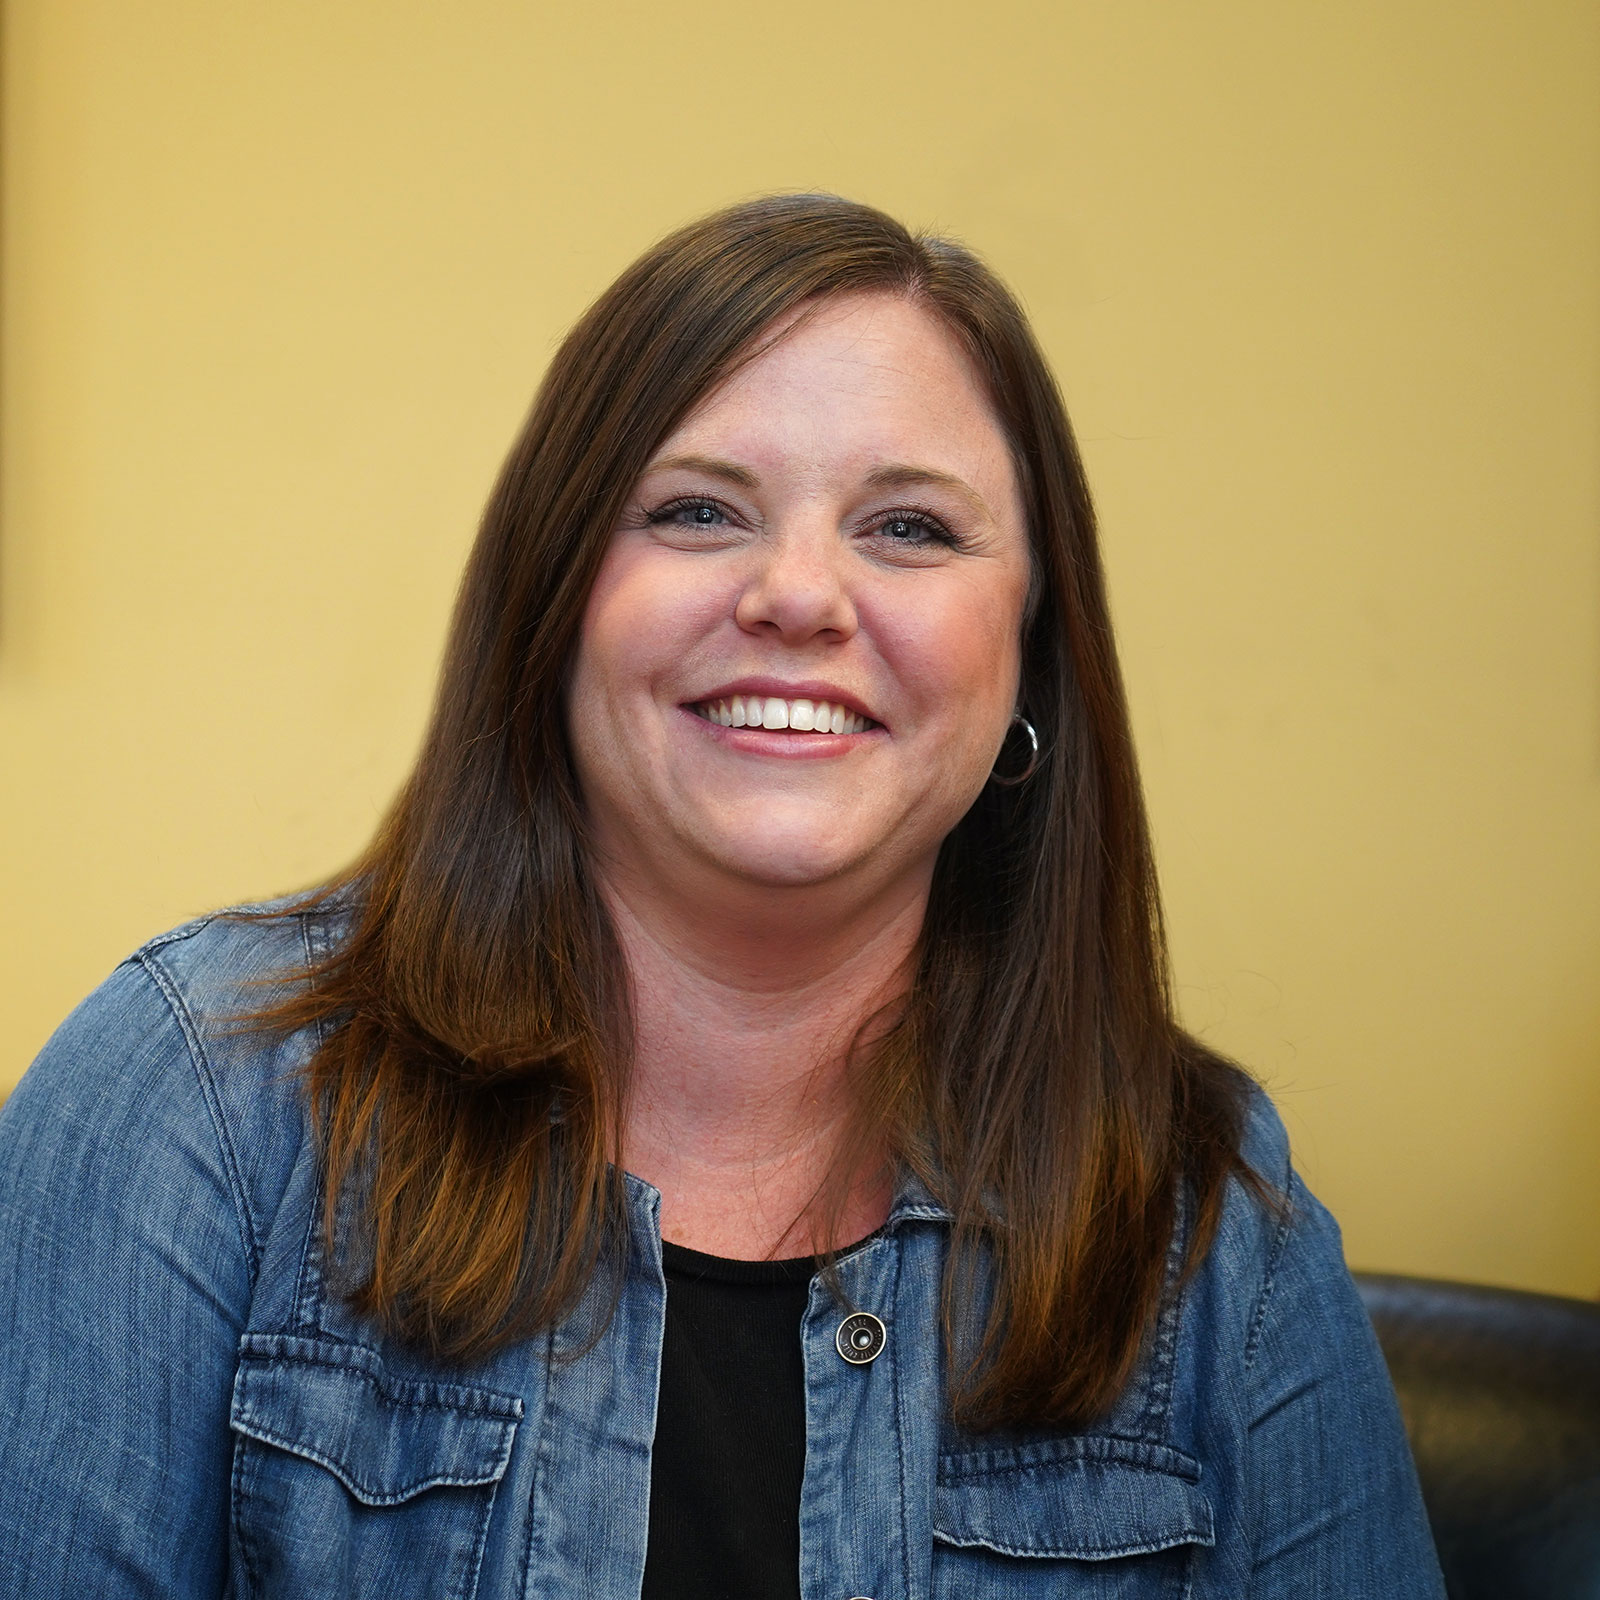 Monica Hester, Director